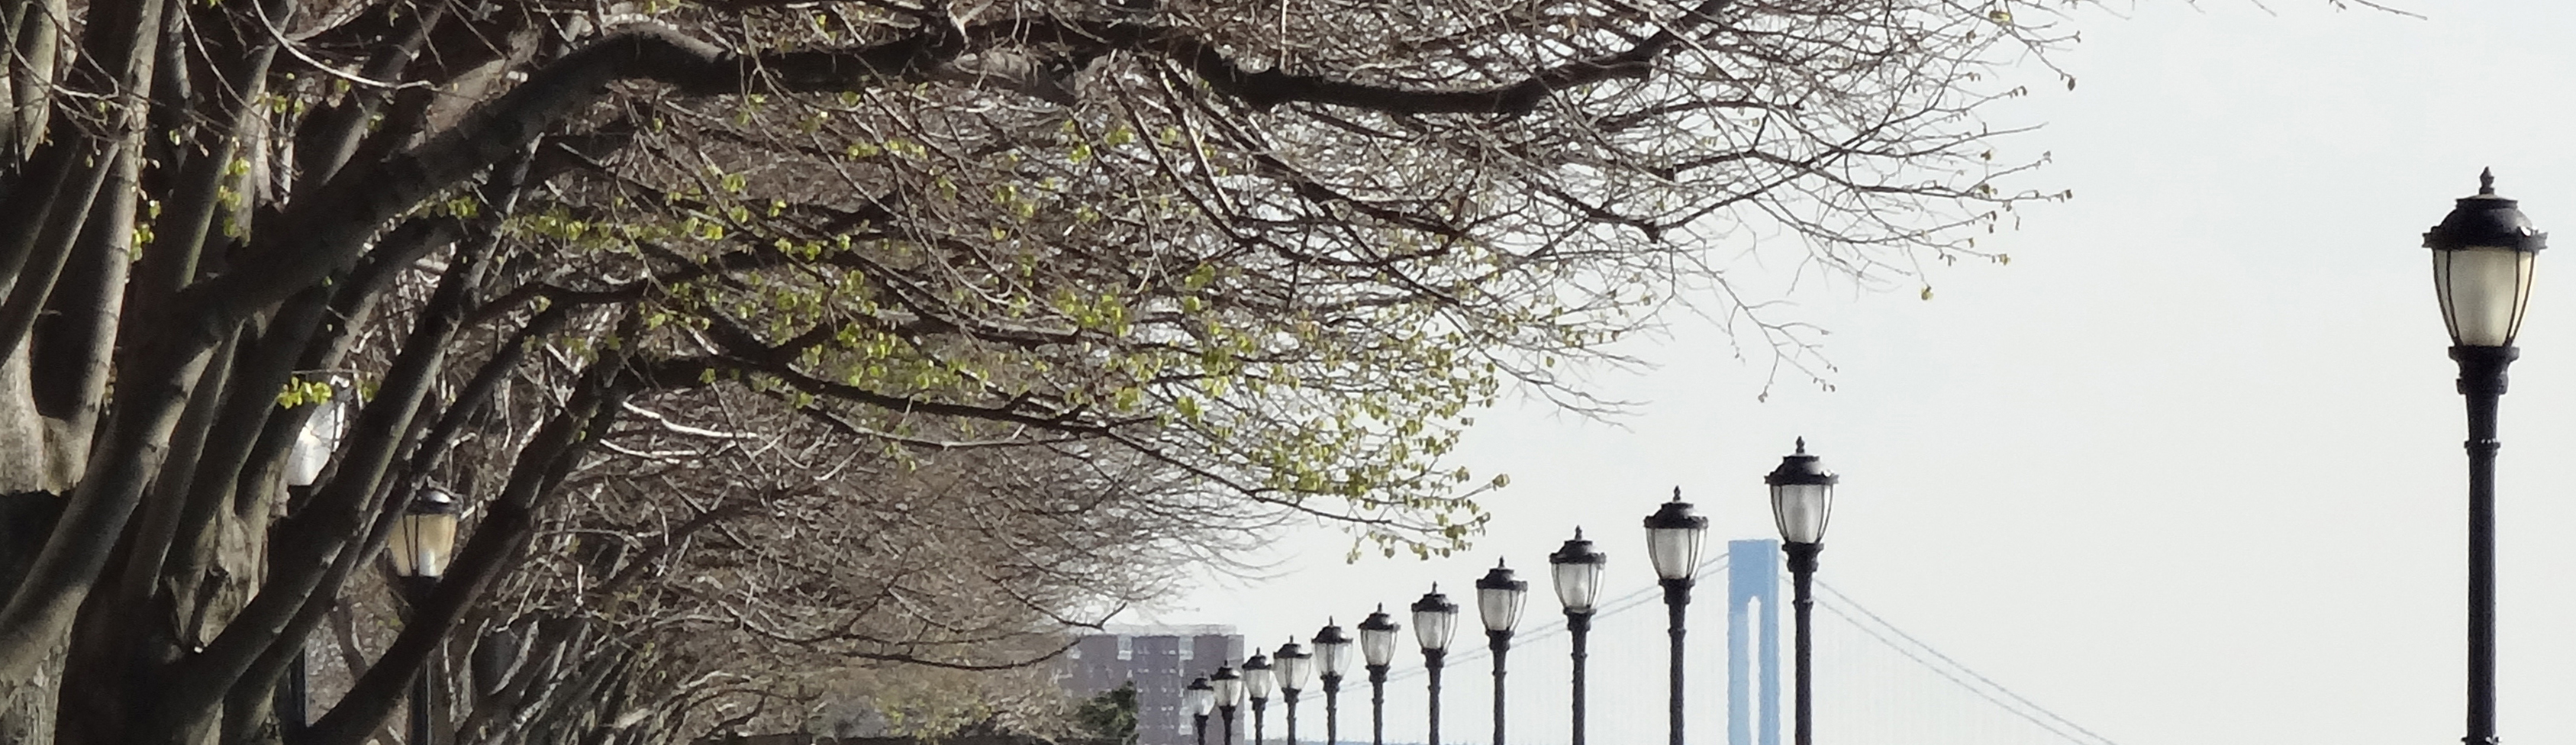 Trees and poles and bridge